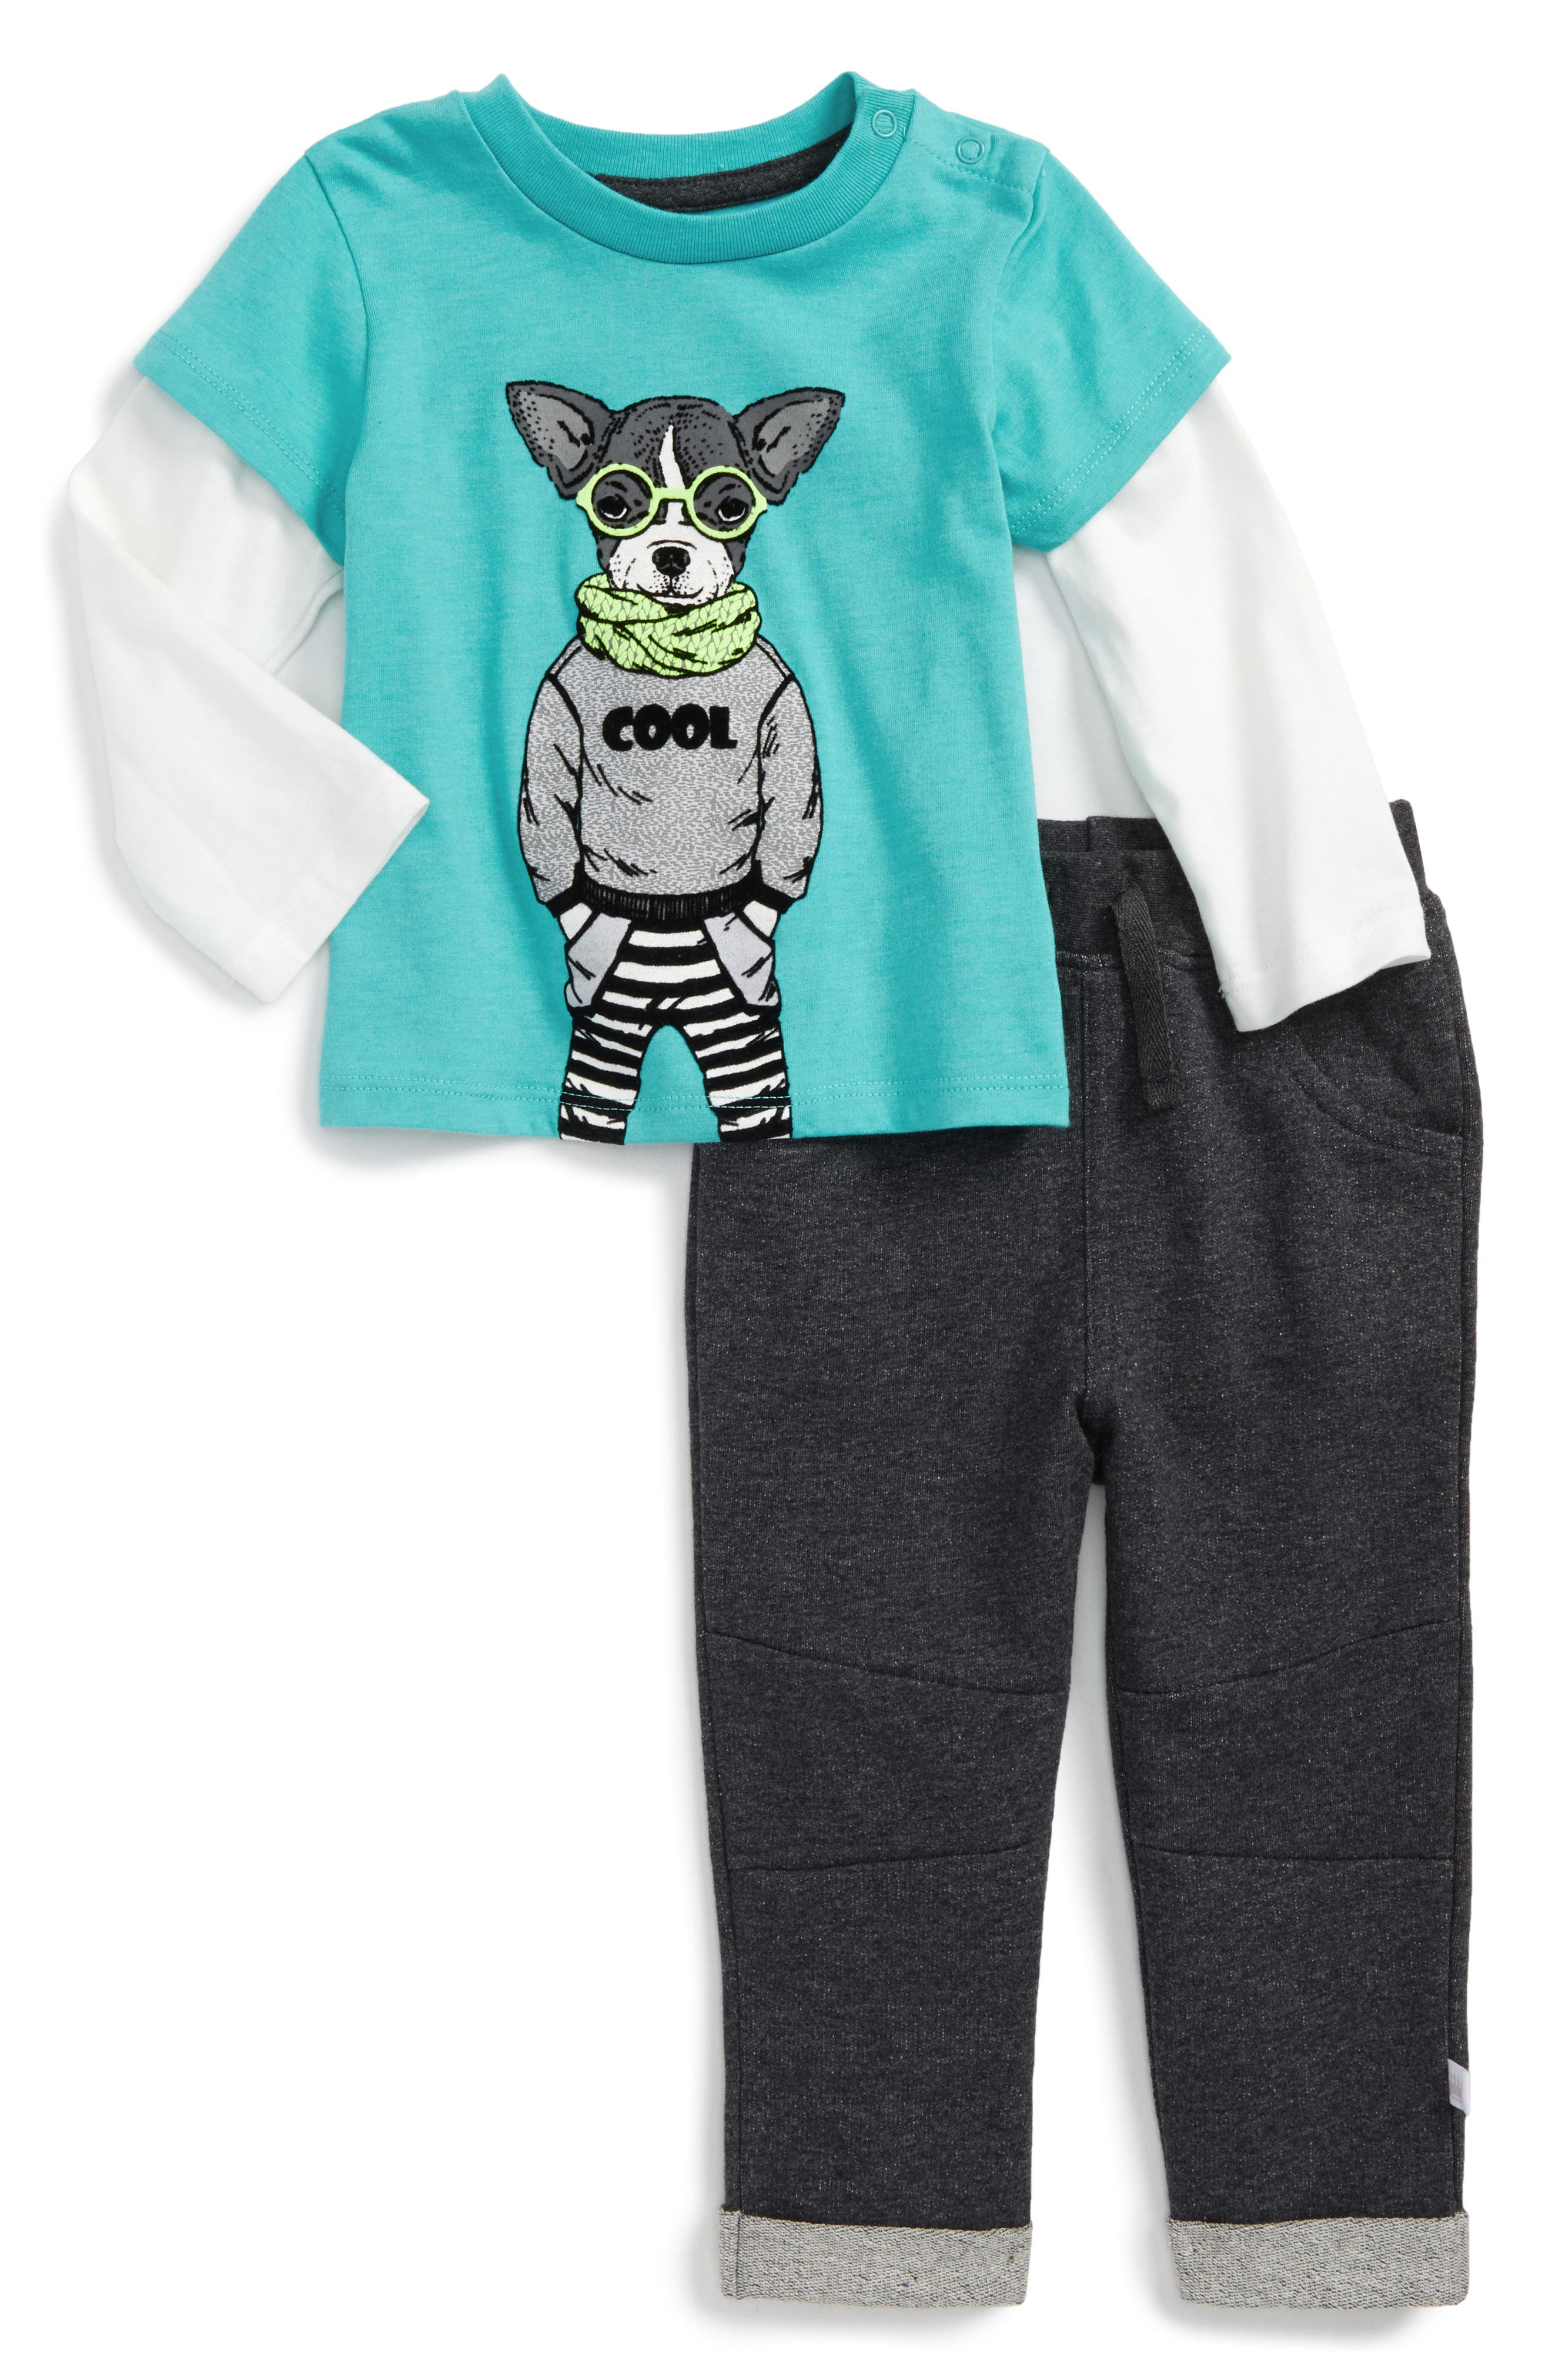 Rosie Pope Nerdy Layered Shirt & Sweatpants Set (Baby Boys)